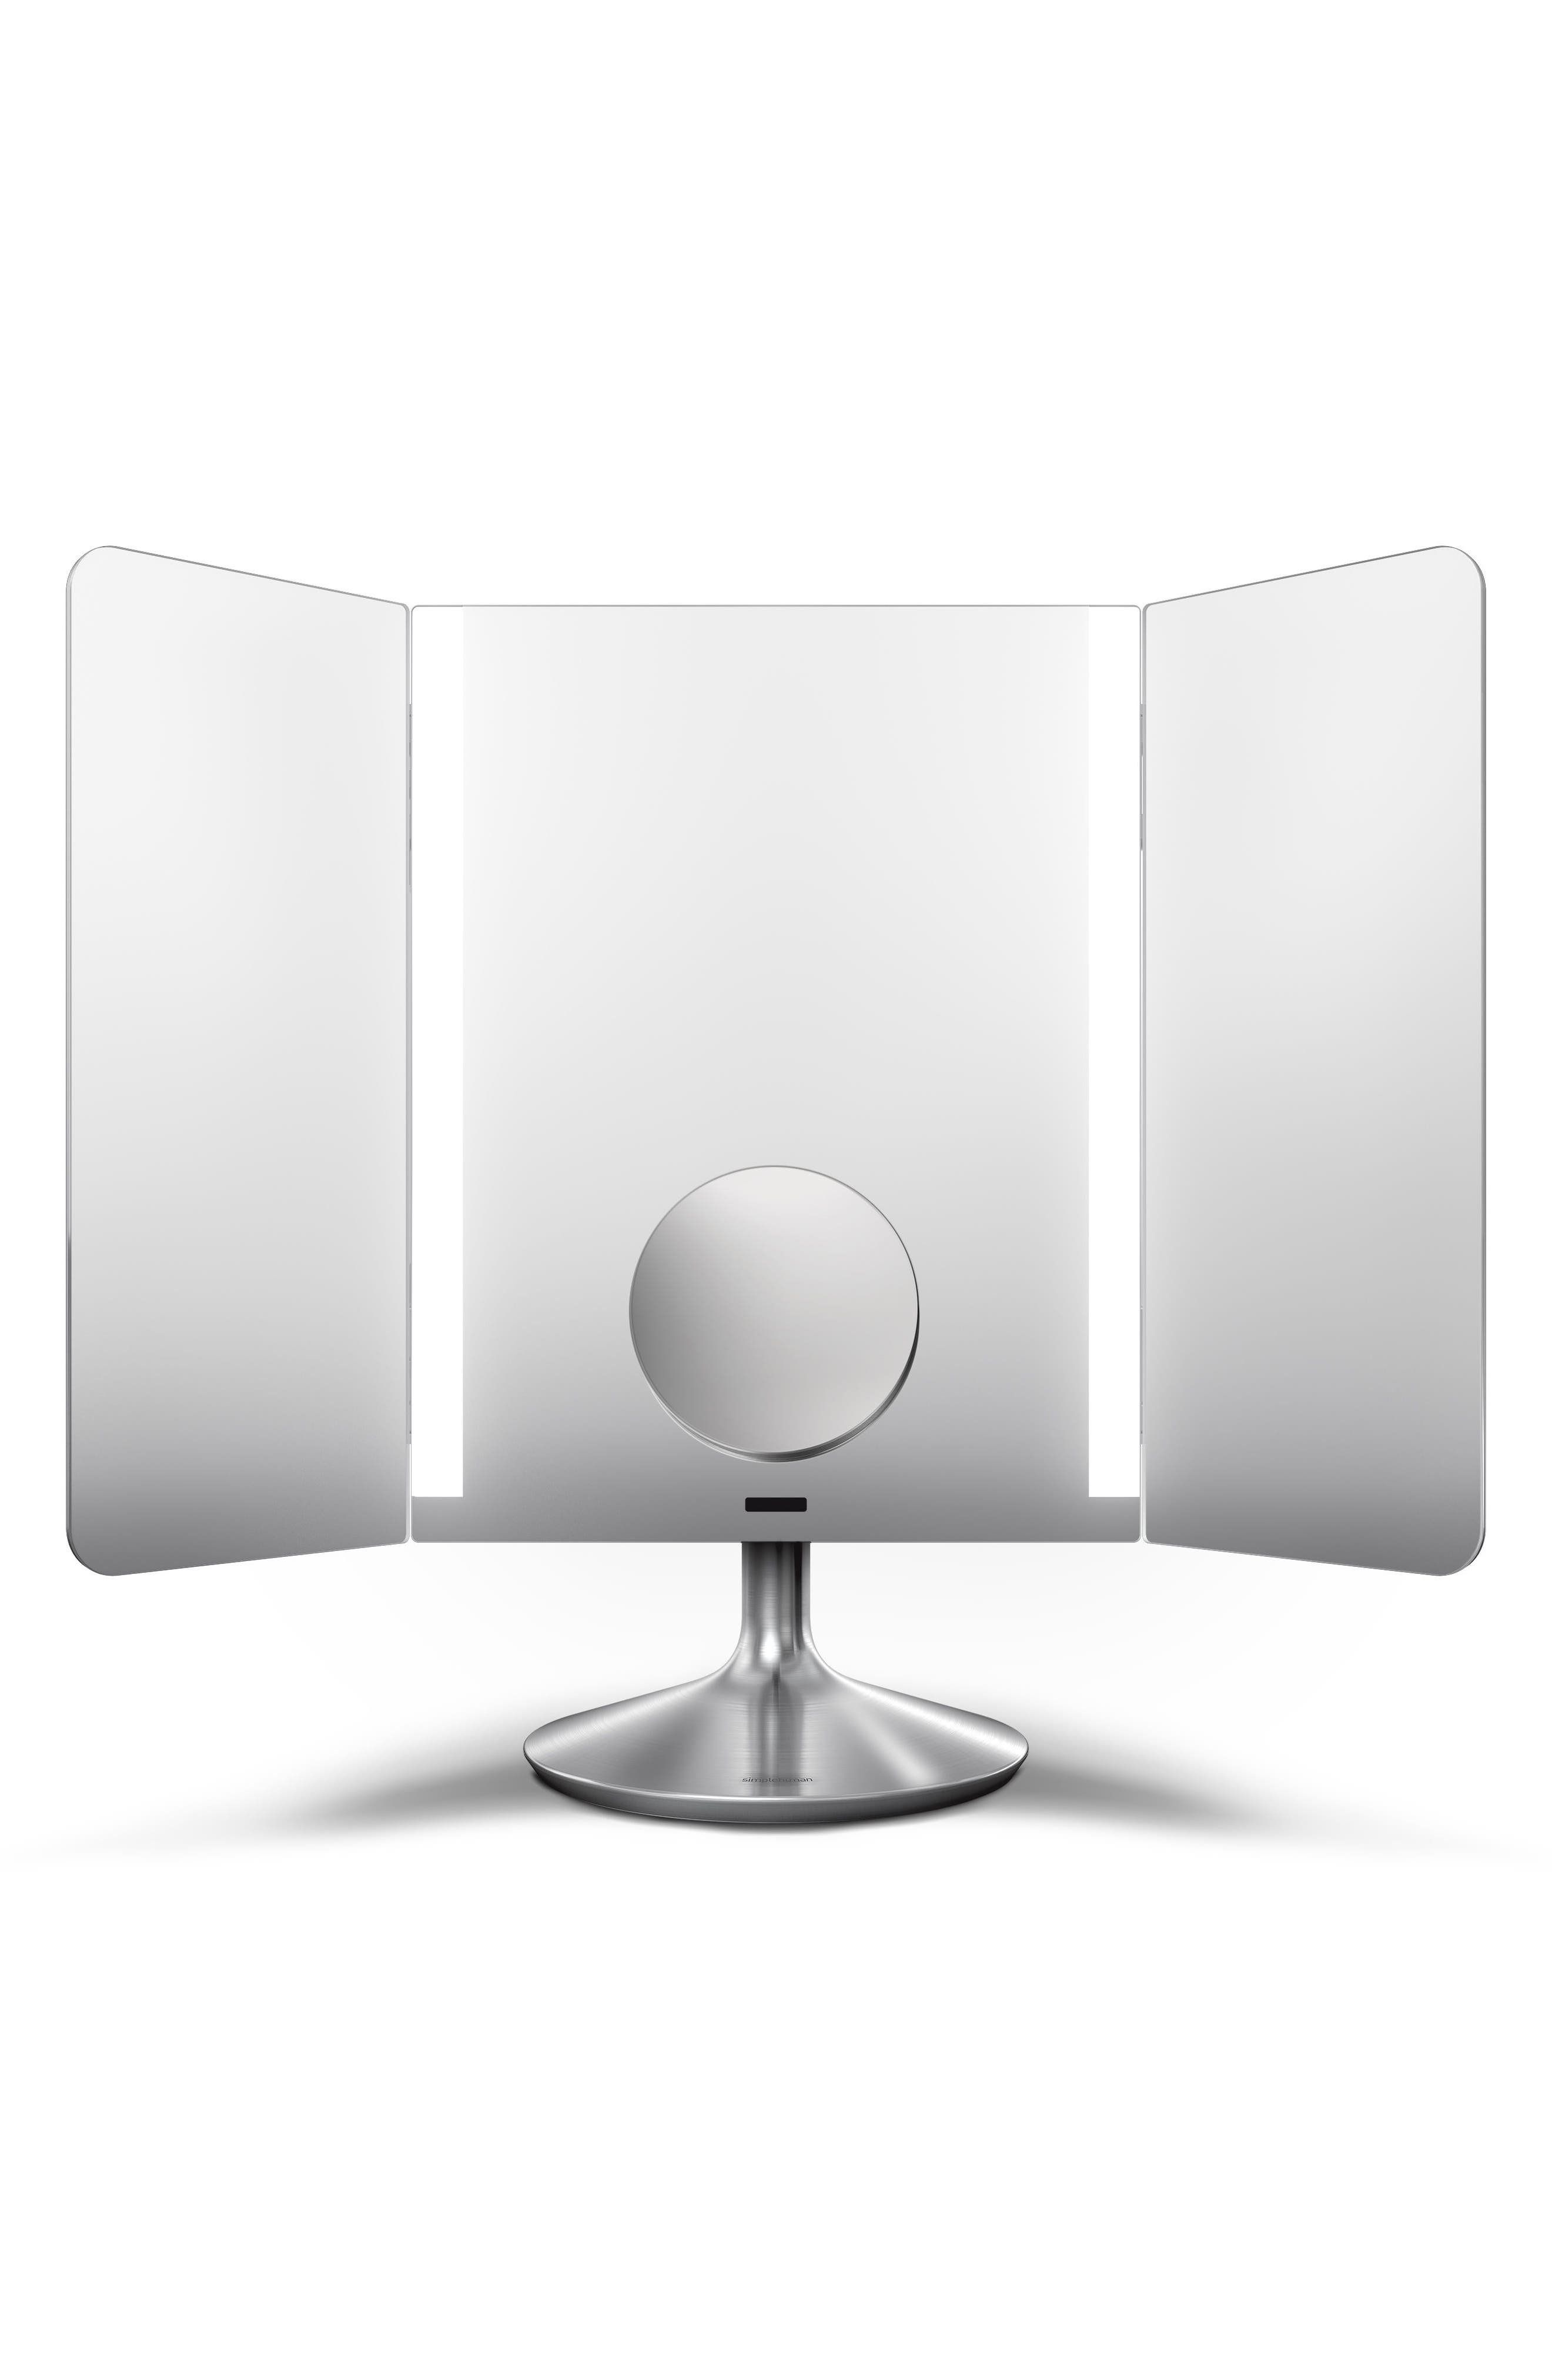 Sensor Mirror Pro Wide View,                             Alternate thumbnail 2, color,                             NO COLOR